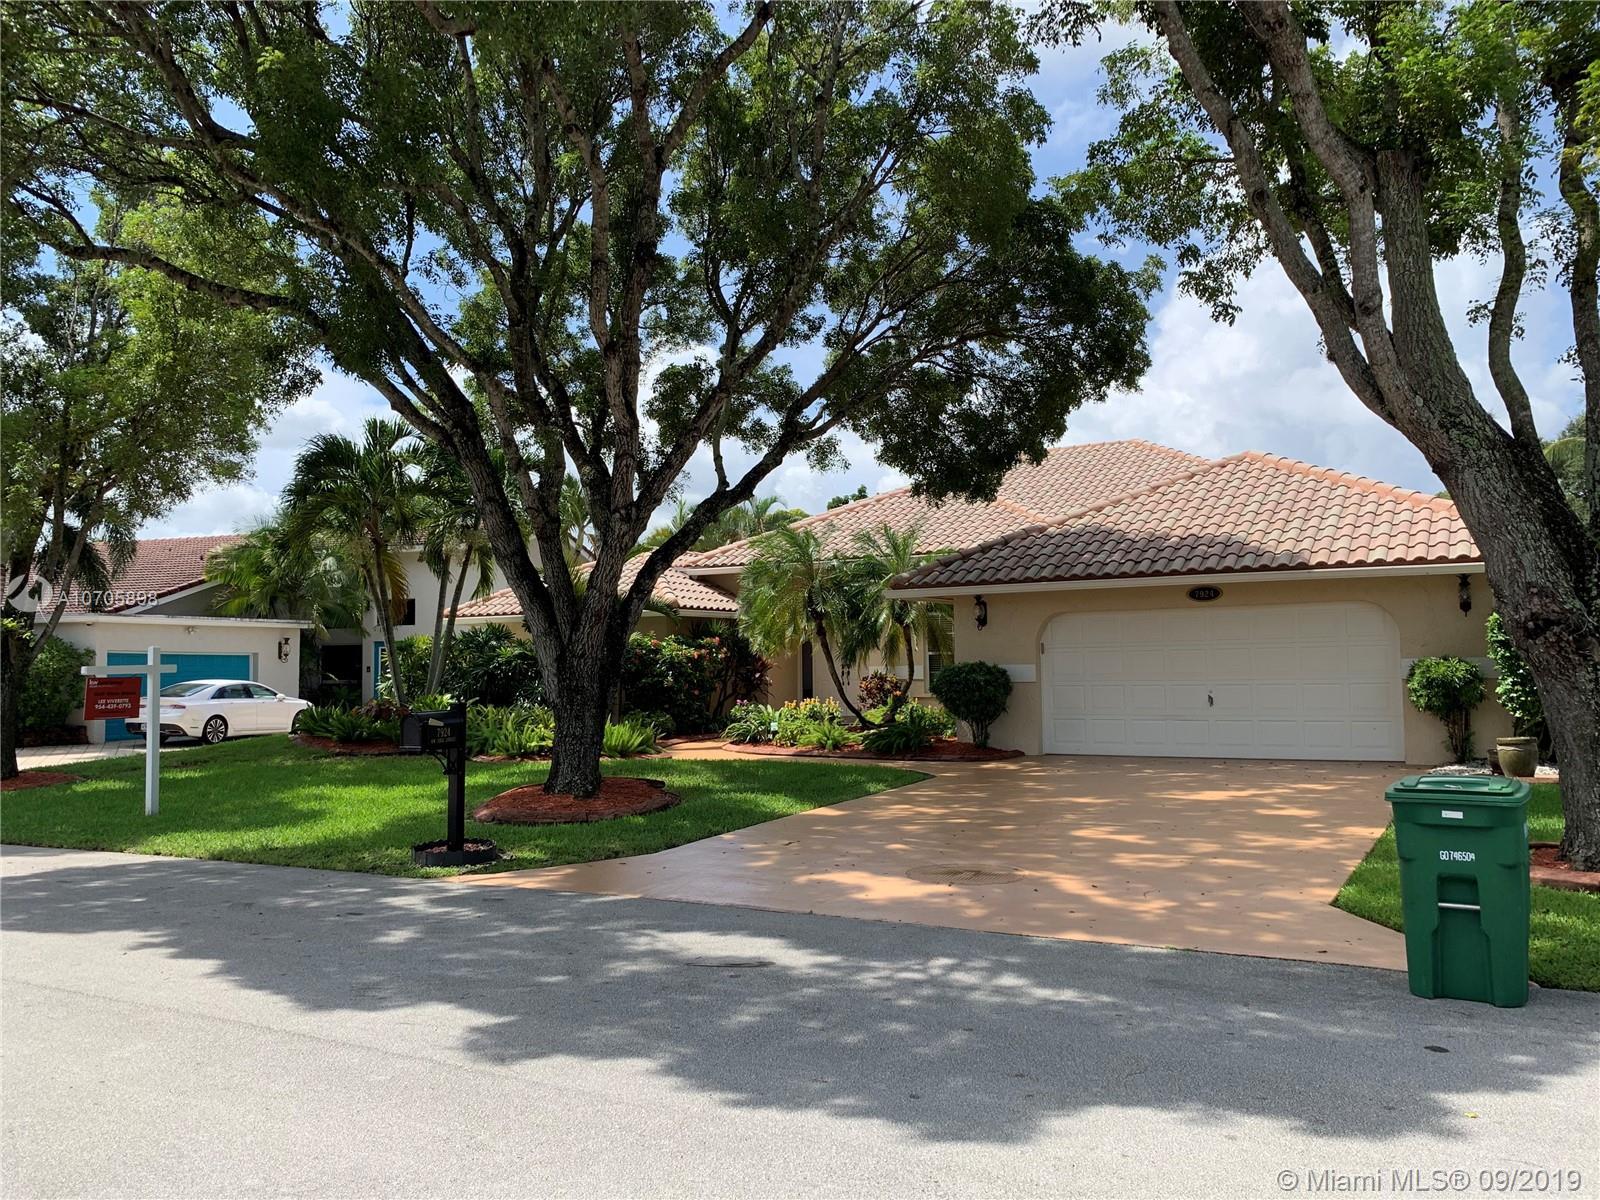 Property for sale at 7924 NW 83rd St, Tamarac FL 33321, Tamarac,  Florida 33321